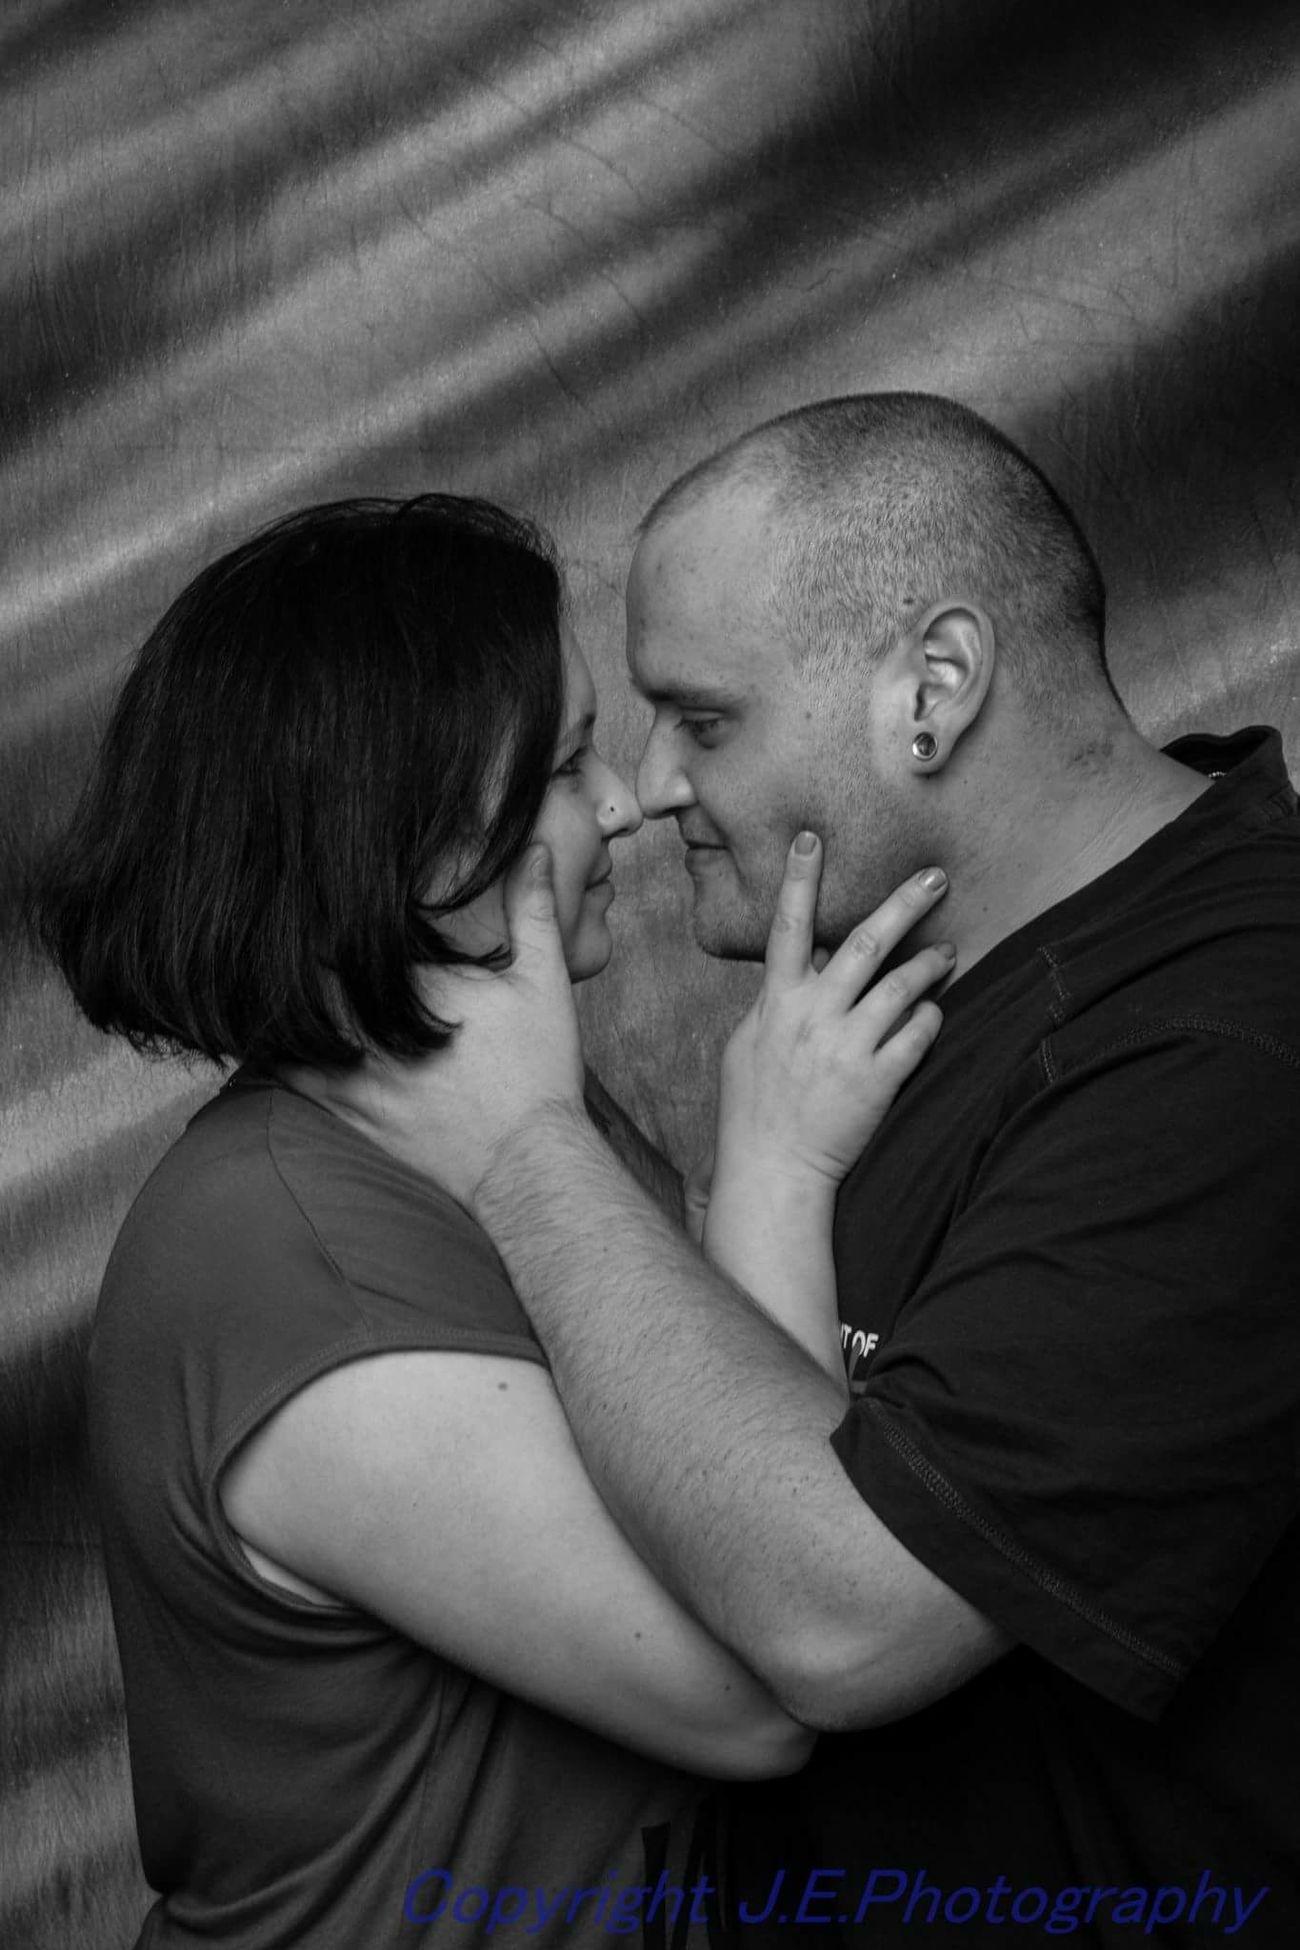 Two People Love Indoors  Real People People Portrait Studio Shoot